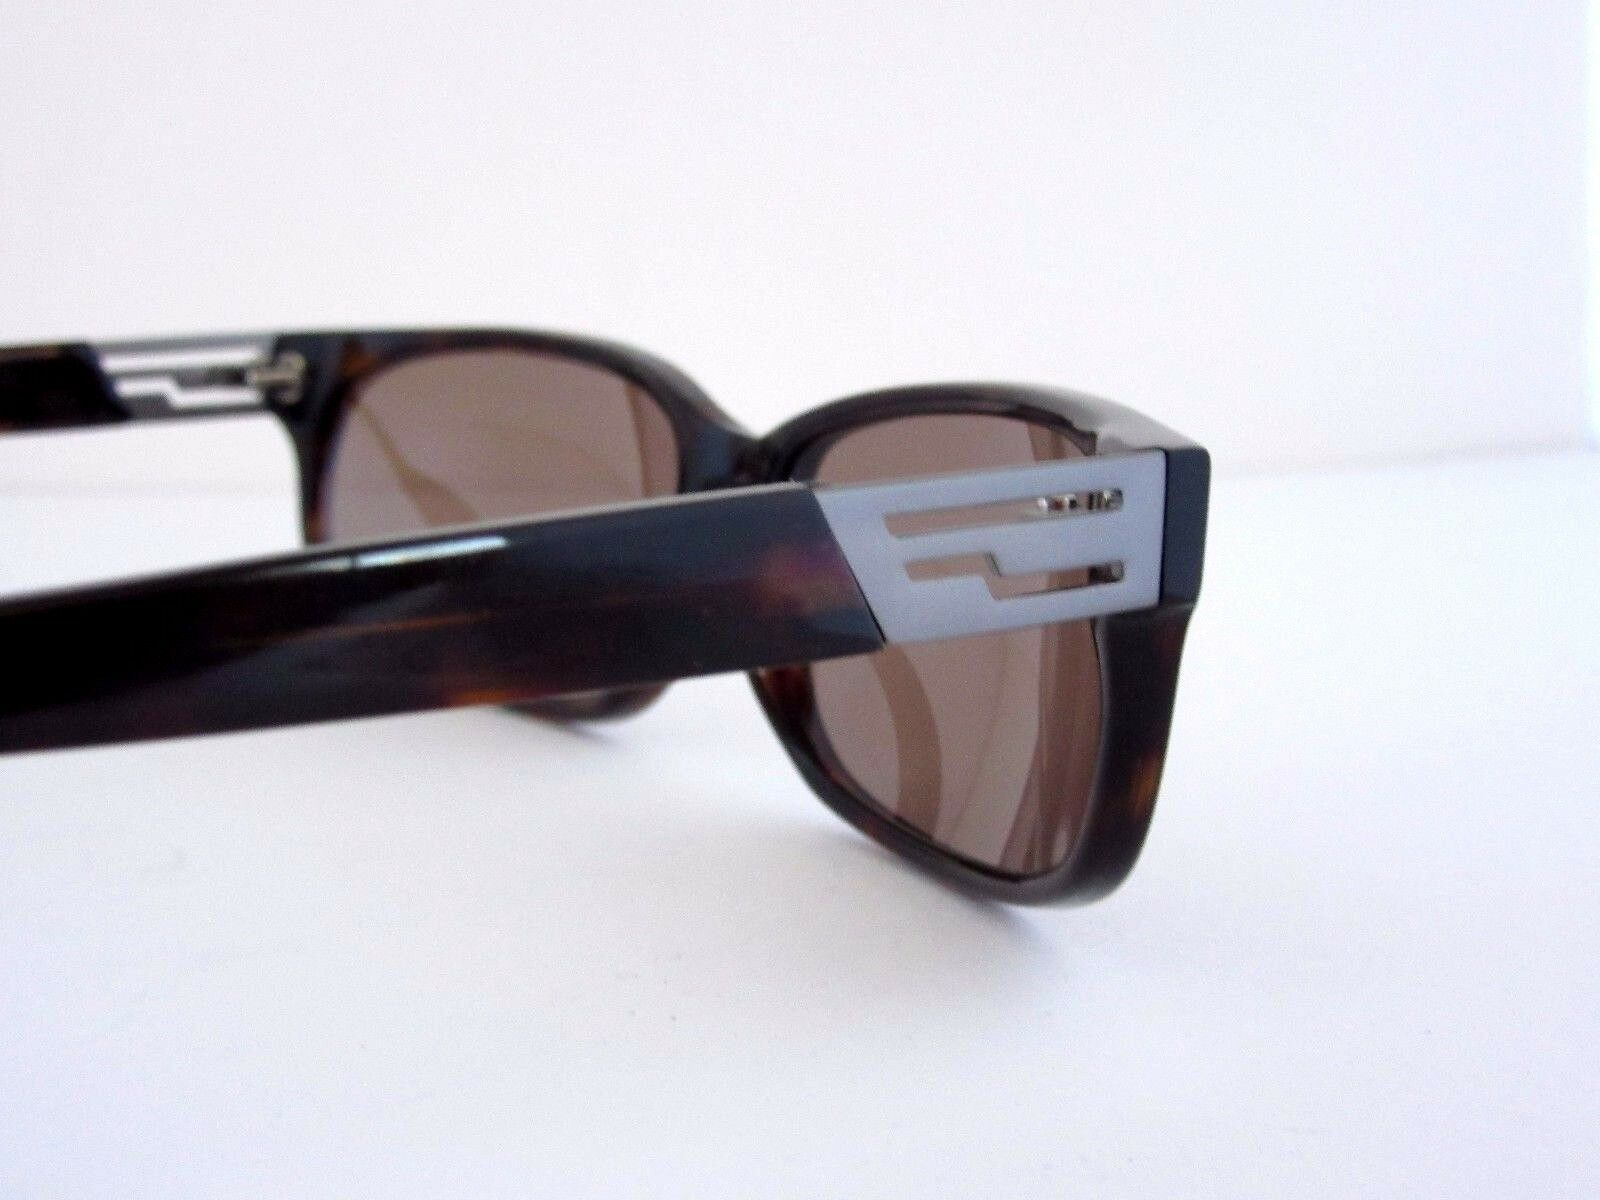 59d9255a0 GANT GS Mariner To-1 61-16-140 Sunglasses for Men Tortoise Authentic ...